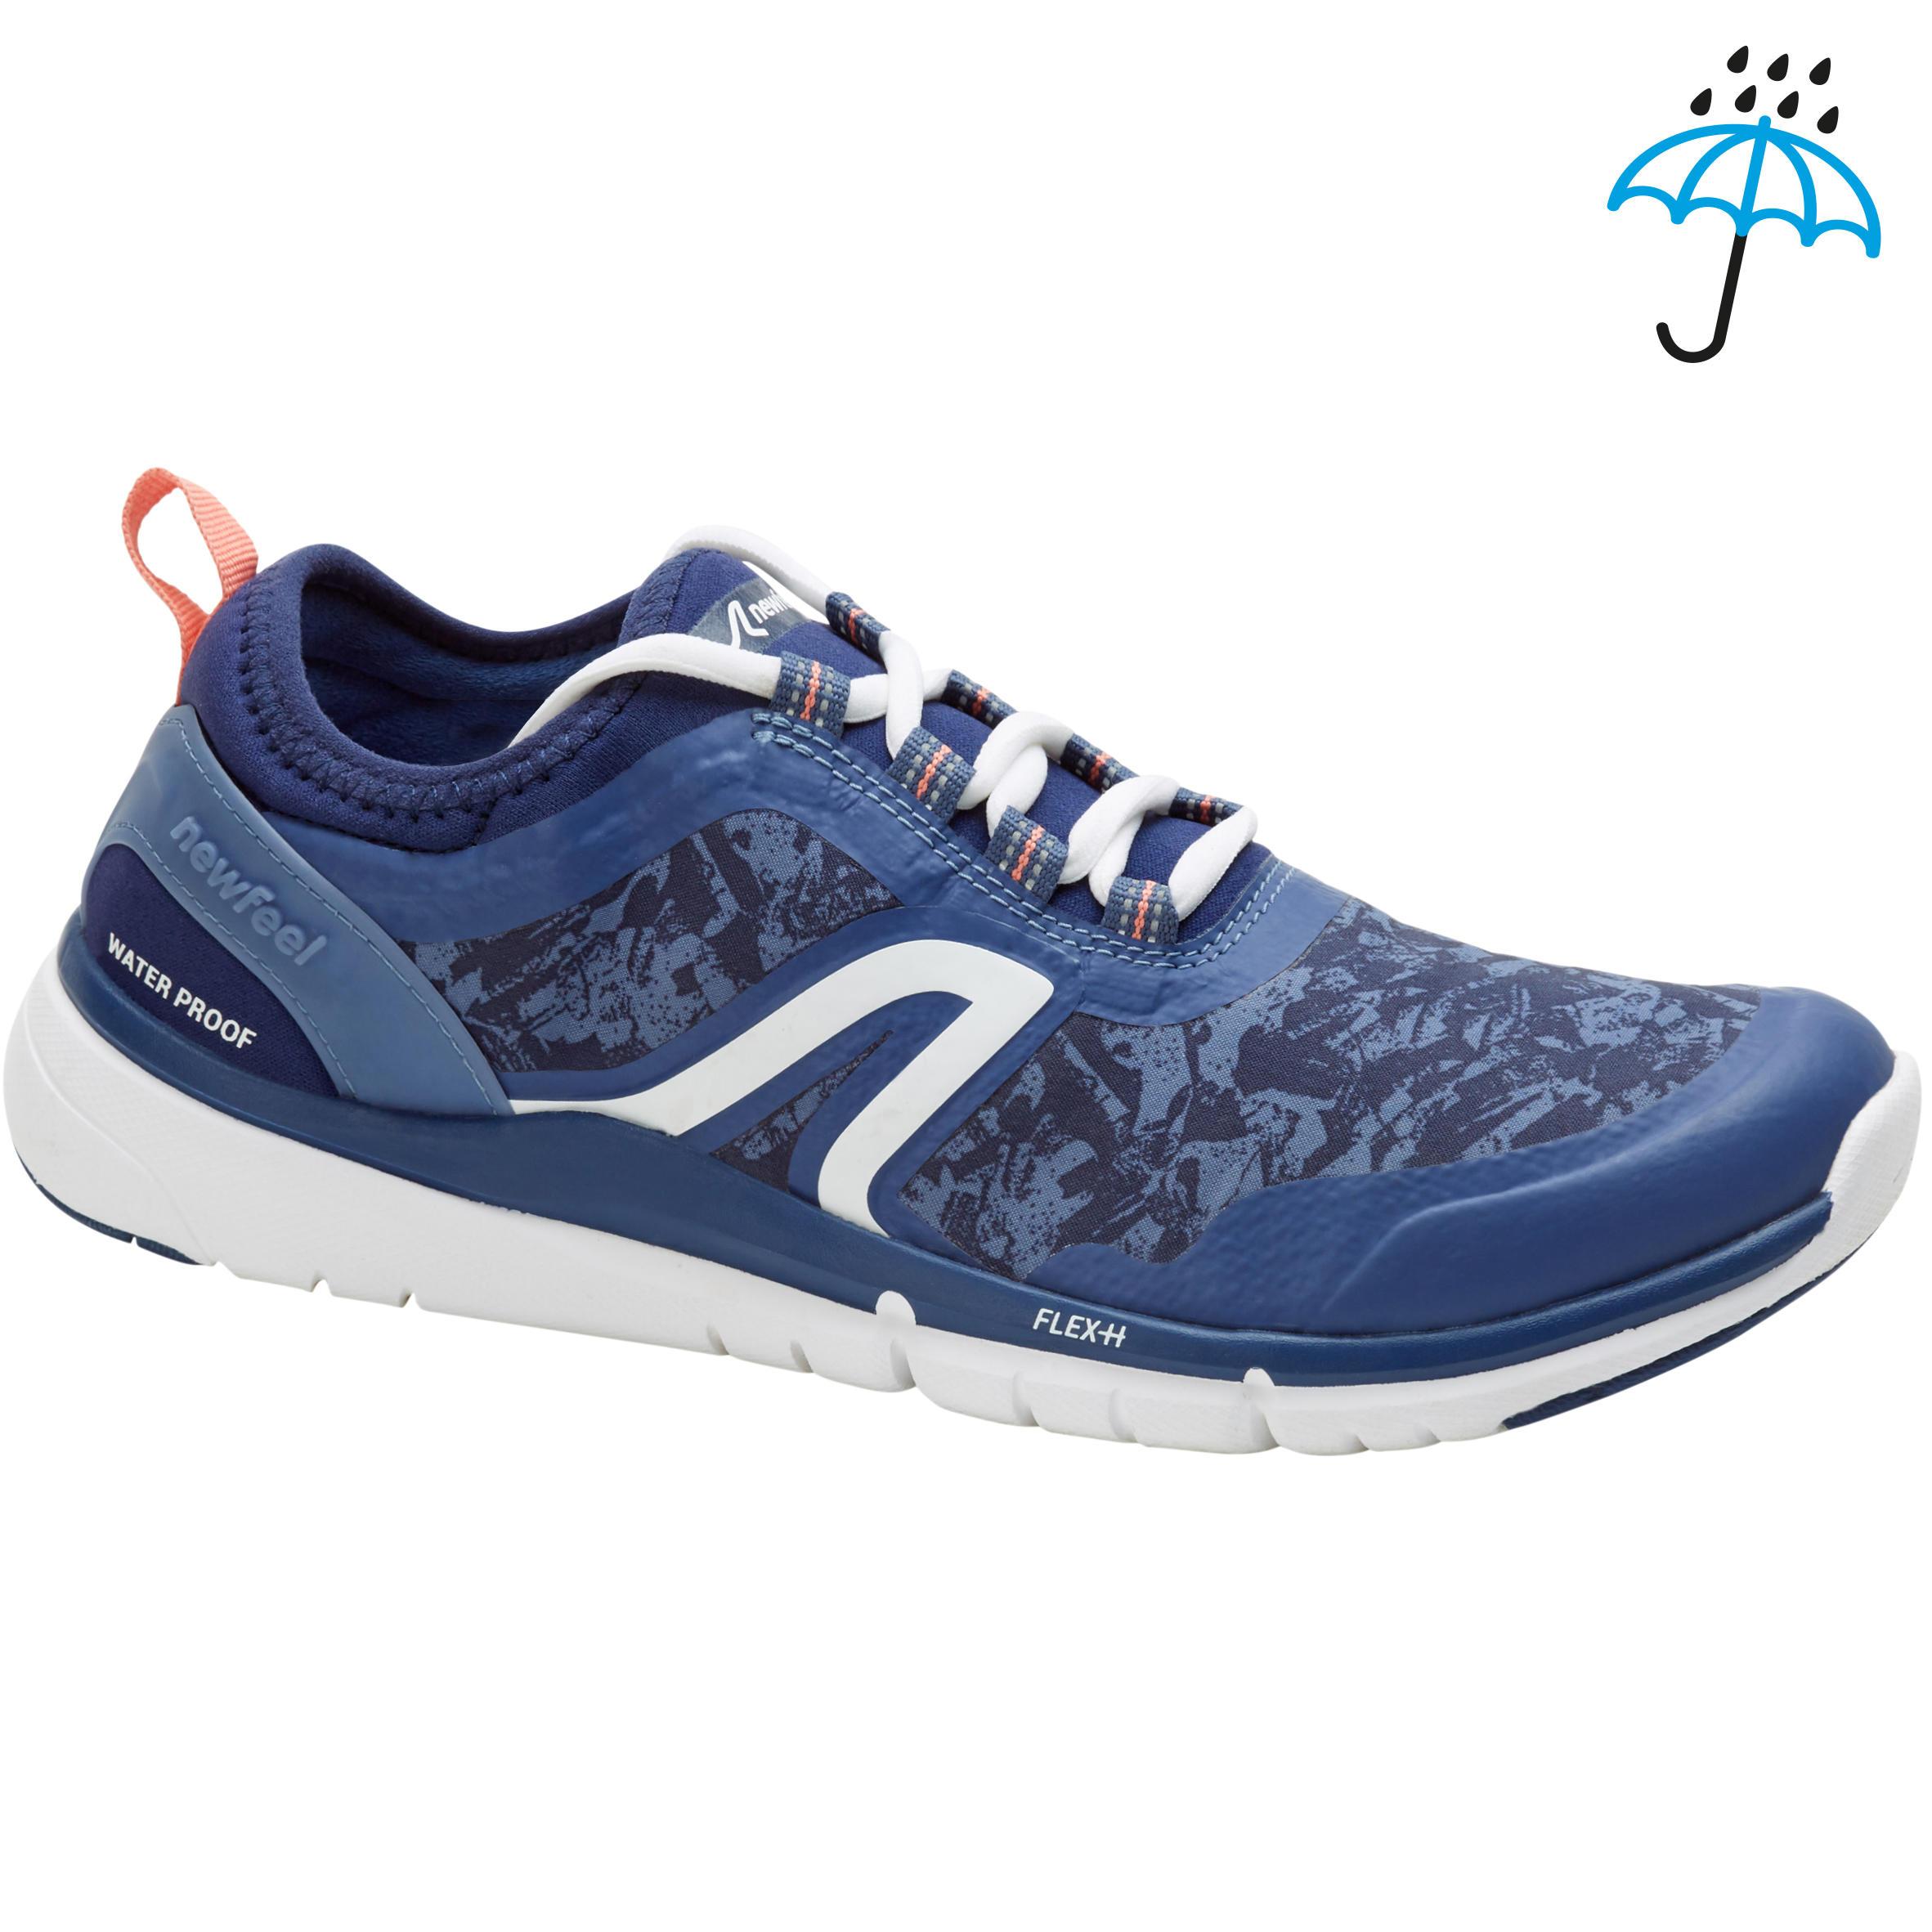 Tenis de caminata deportiva para mujer PW 580 Waterproof azul marino / rosa